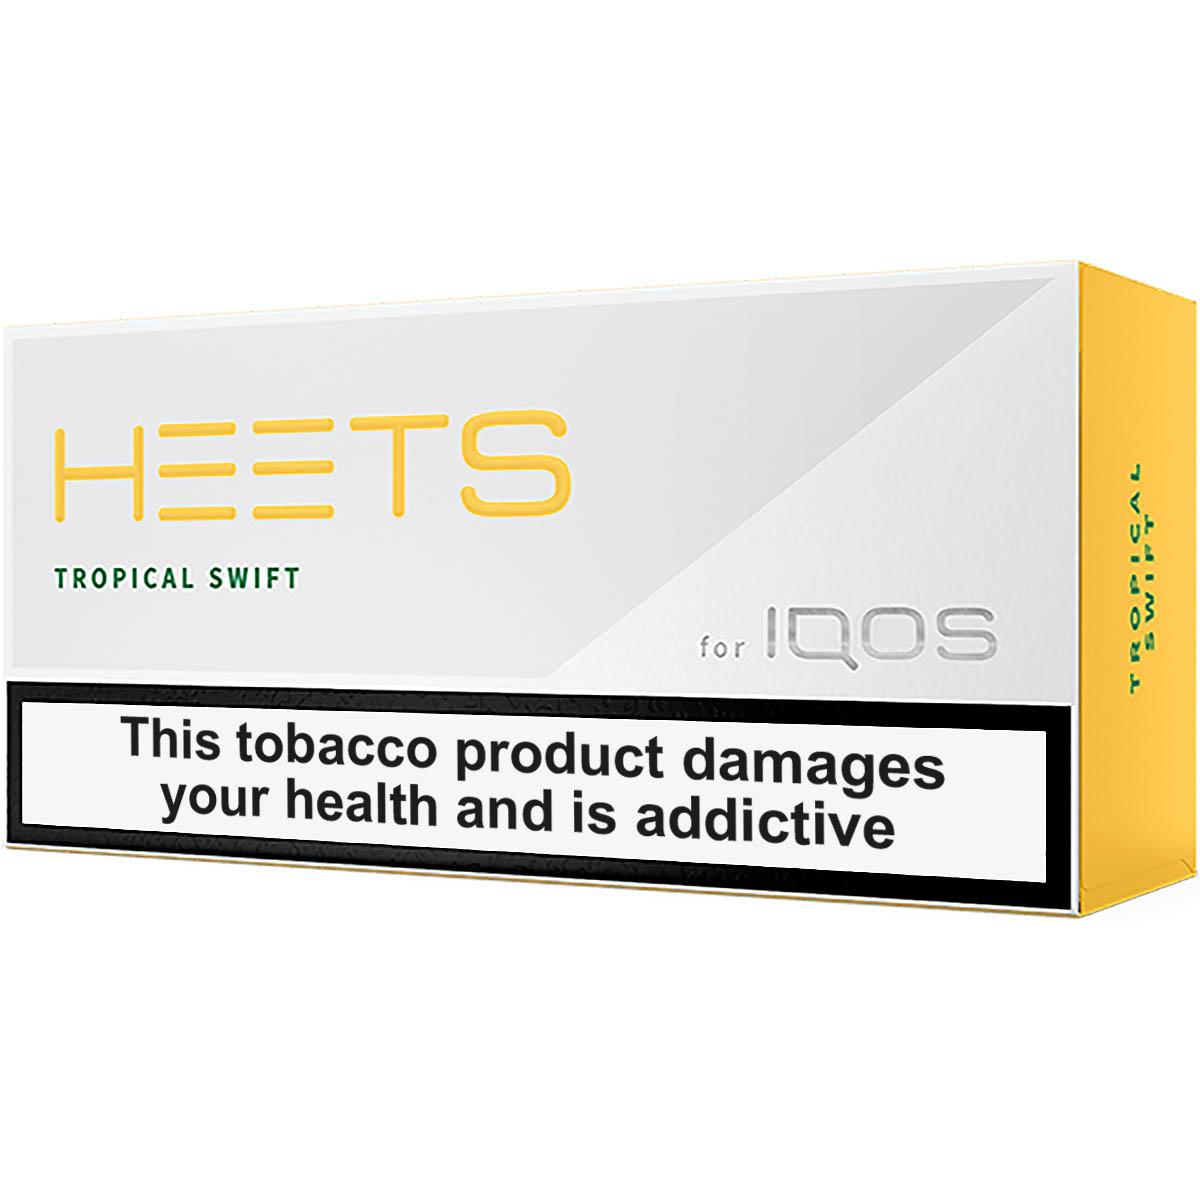 Heets - Tropical Swift